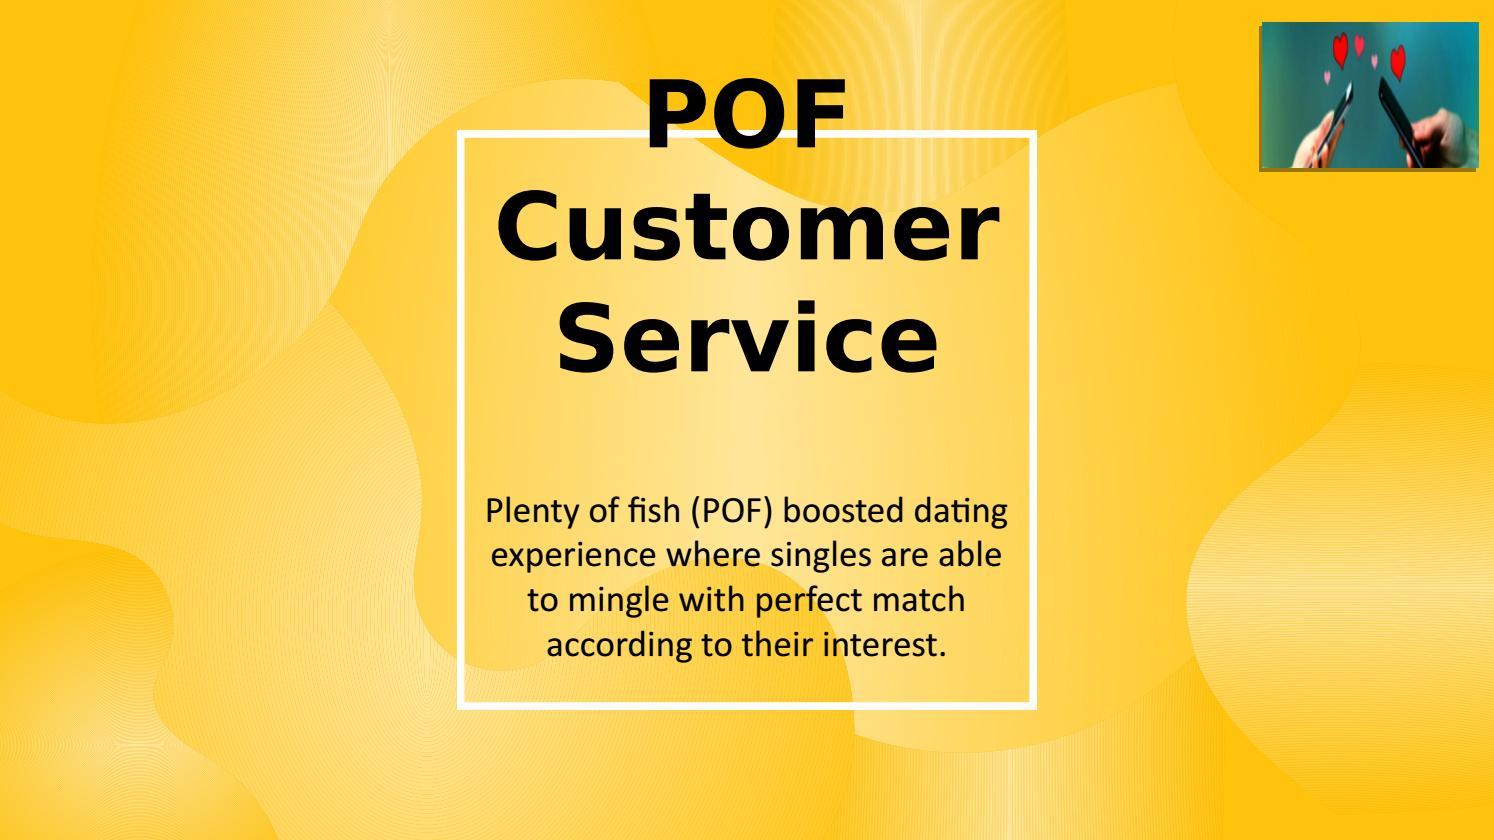 pof dating service